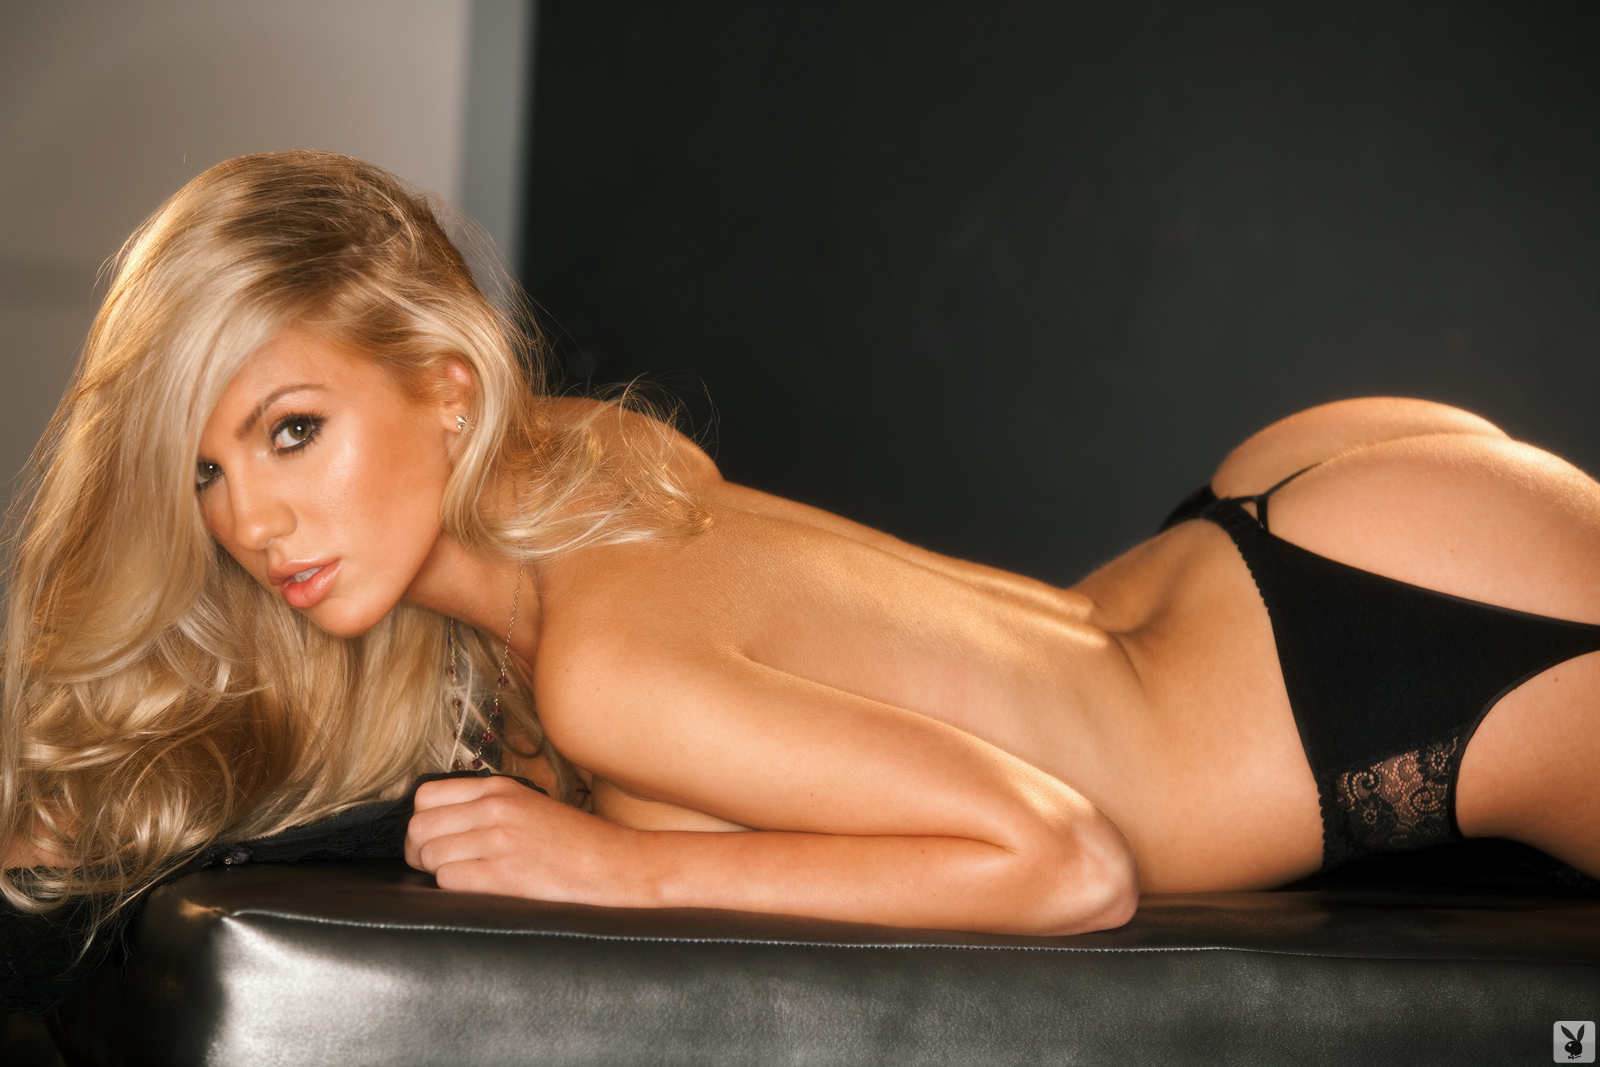 Bikini sydney barlette